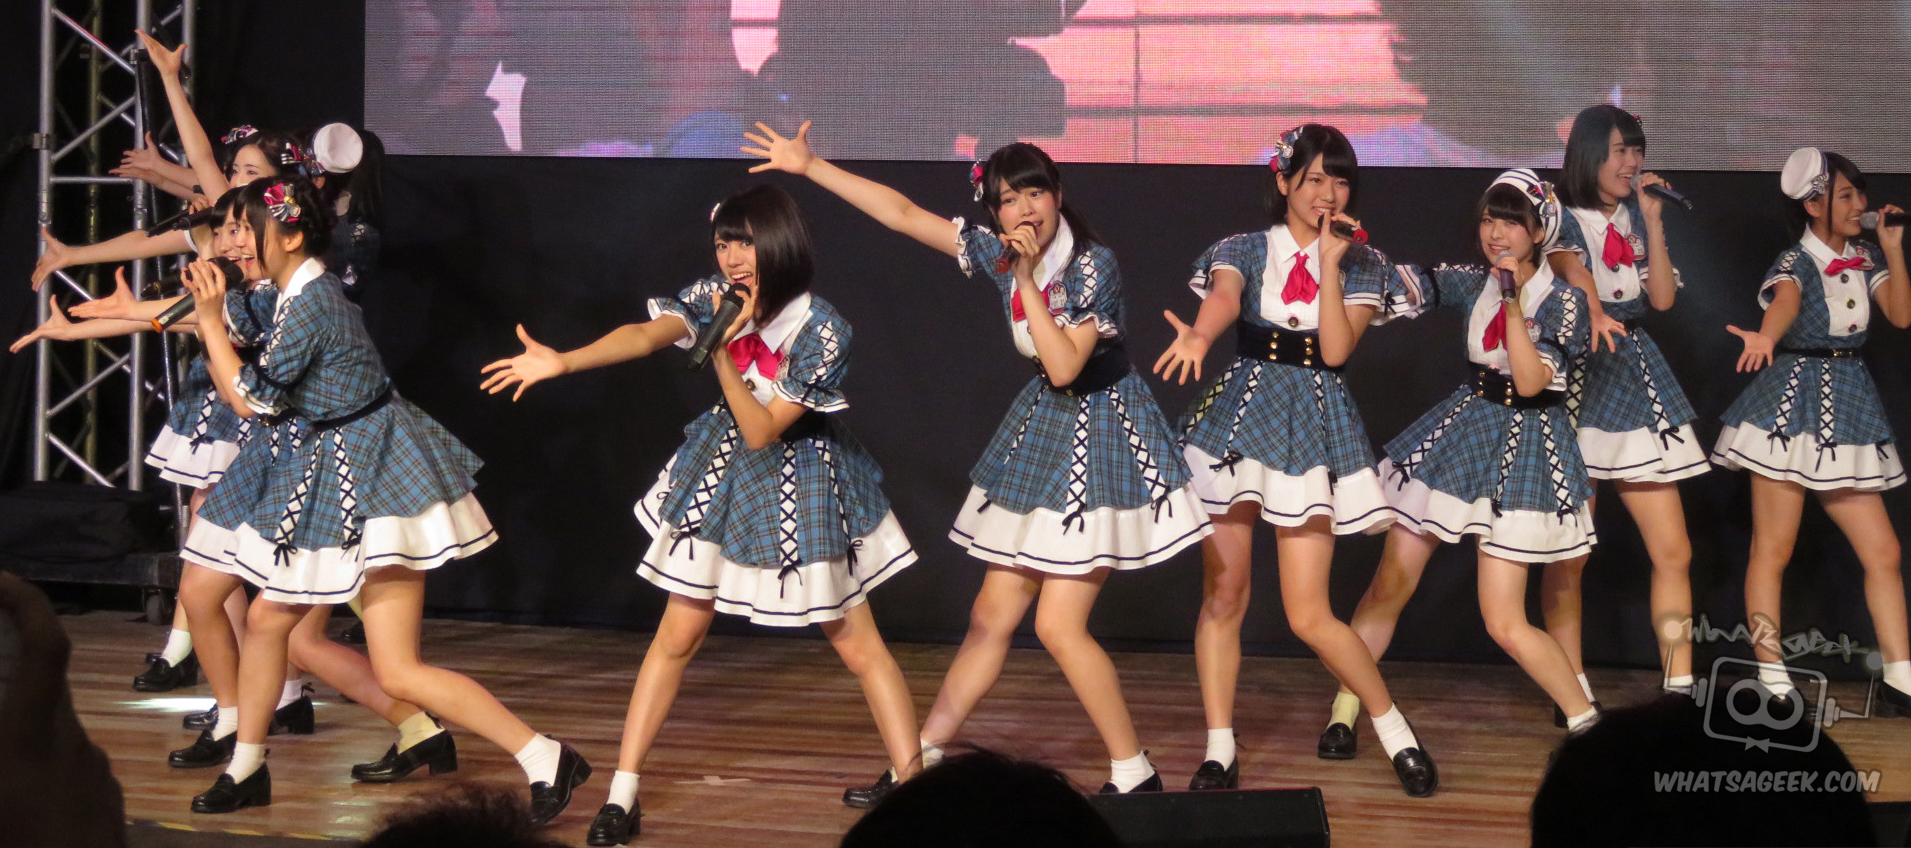 Japan Off The Beaten Path Tours